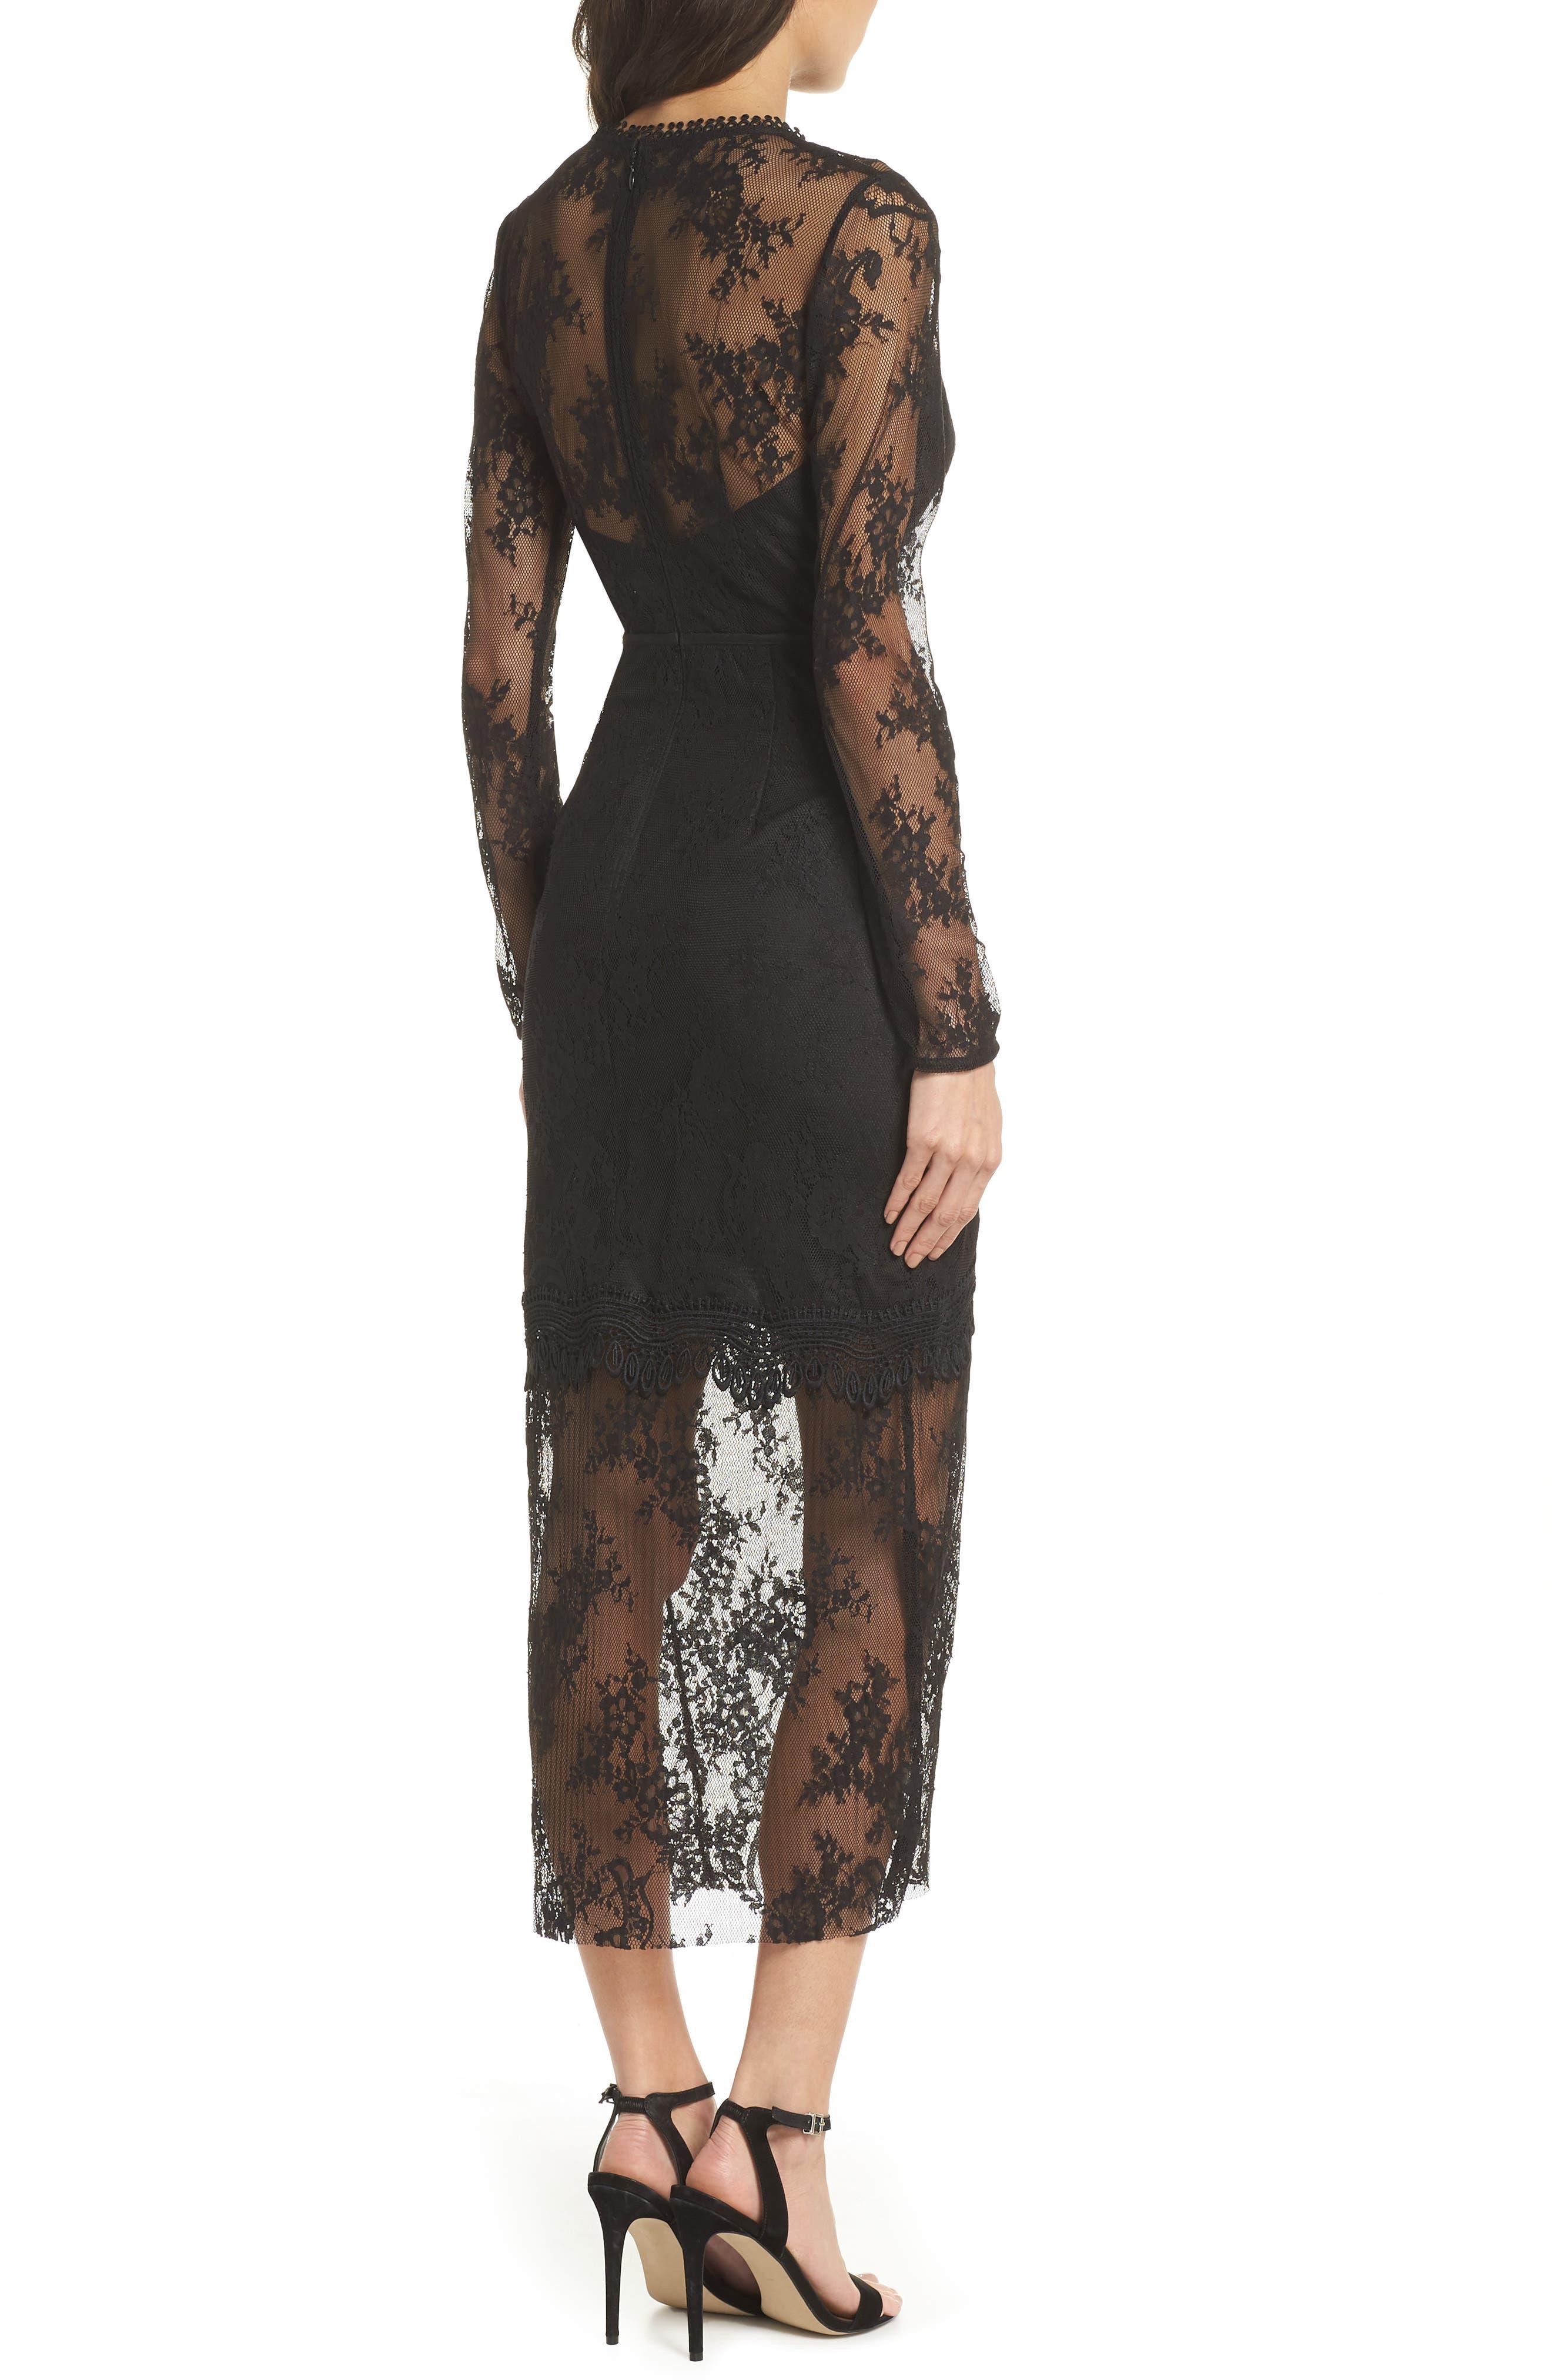 True Chemistry Lace Sheath Dress,                             Alternate thumbnail 2, color,                             Black